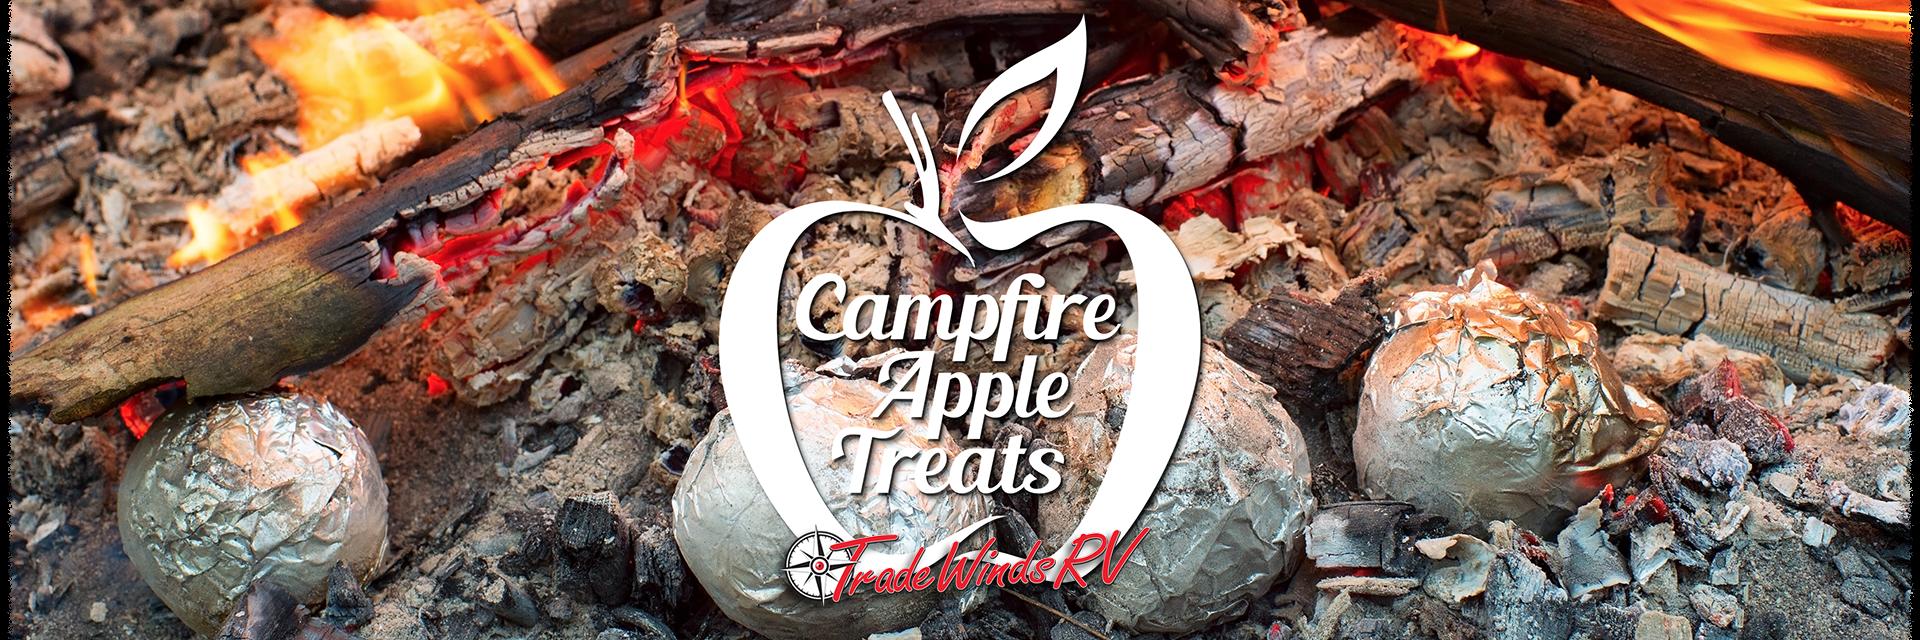 campfire apple treats banner